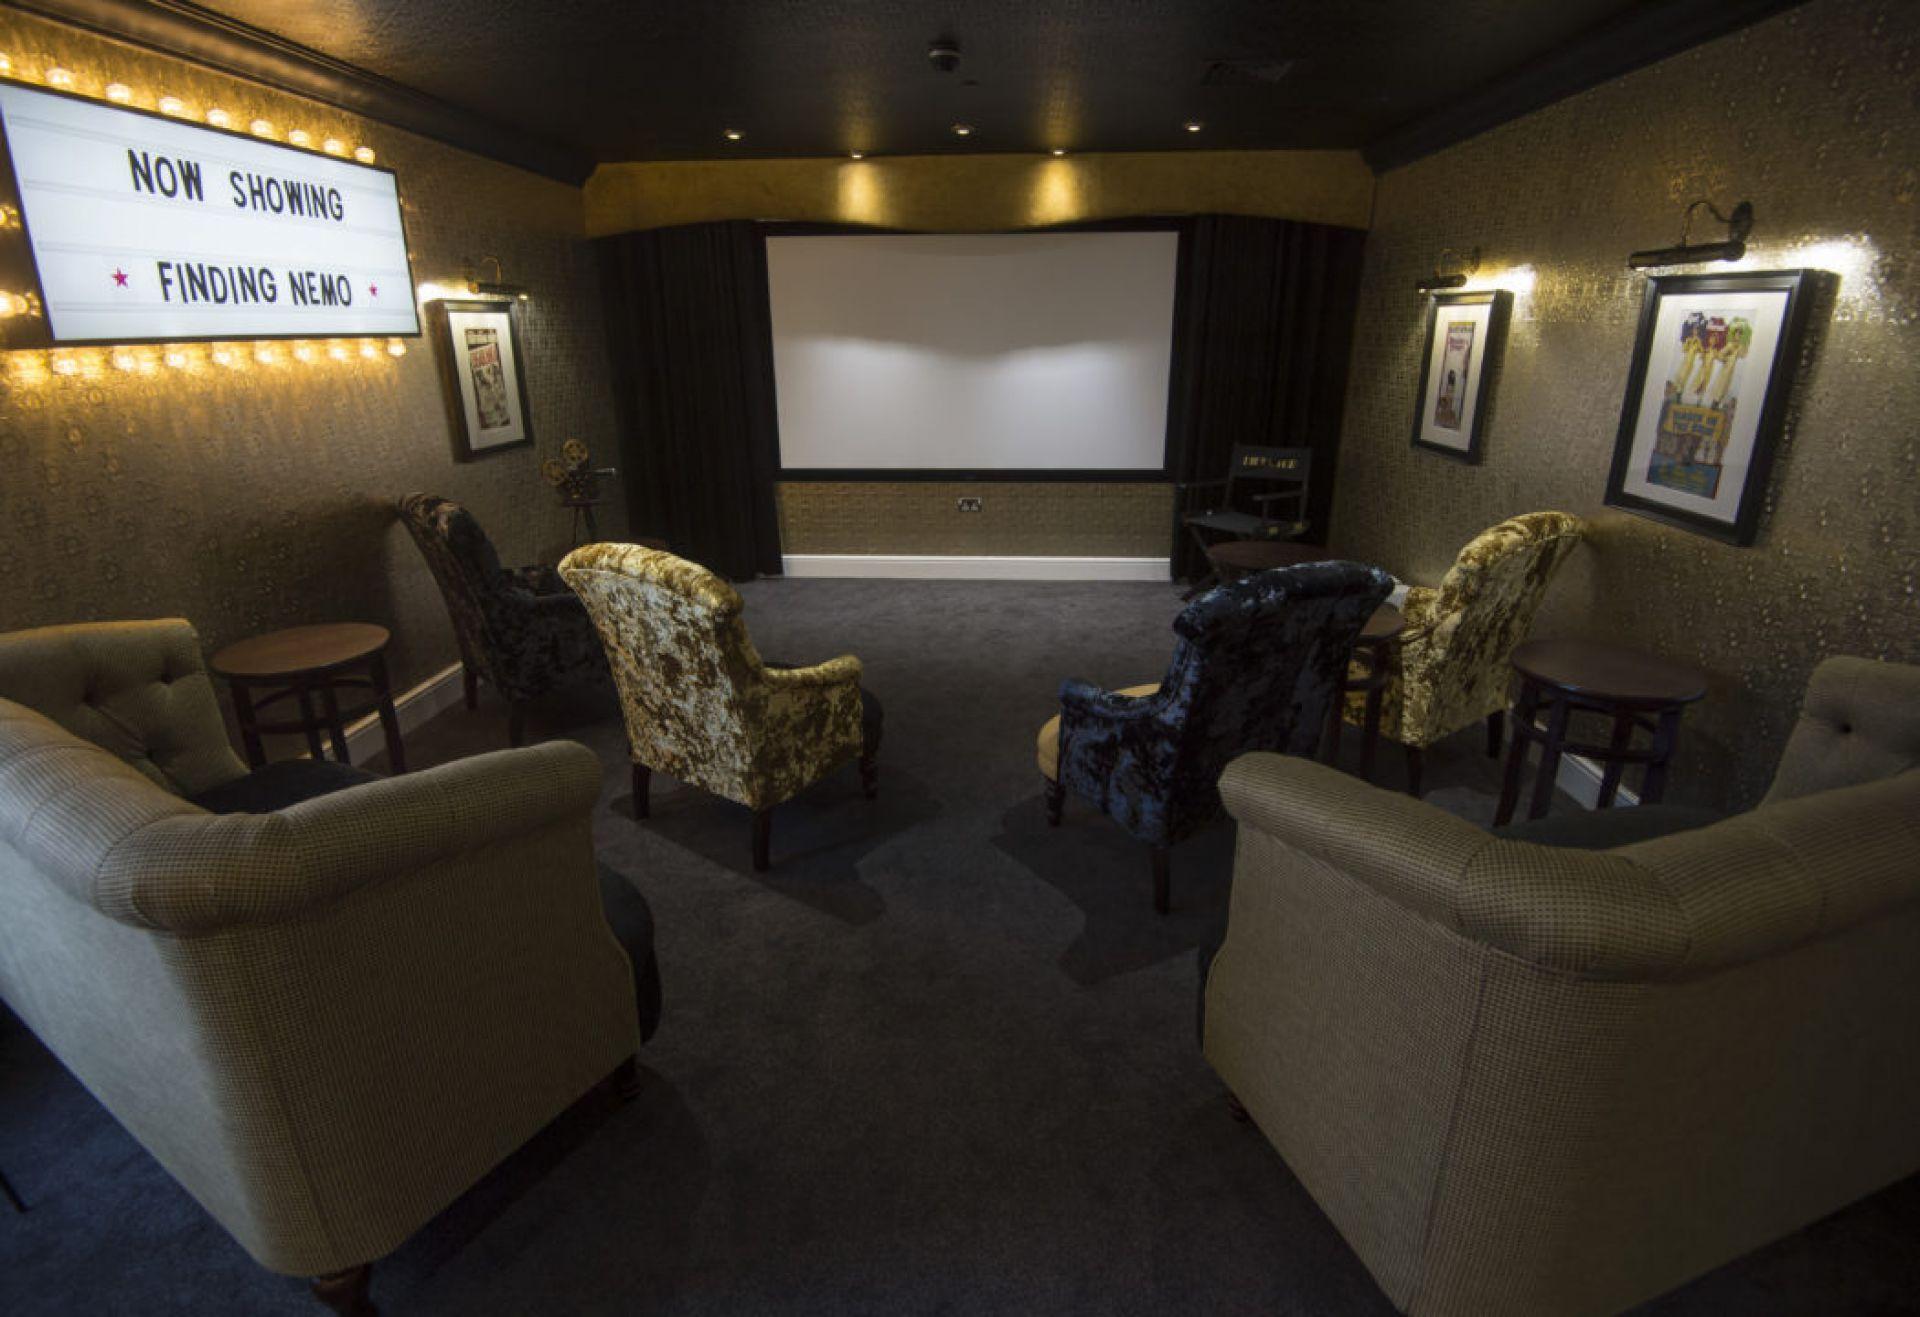 Baycroft-Orpington-cinema-1050x720.jpg